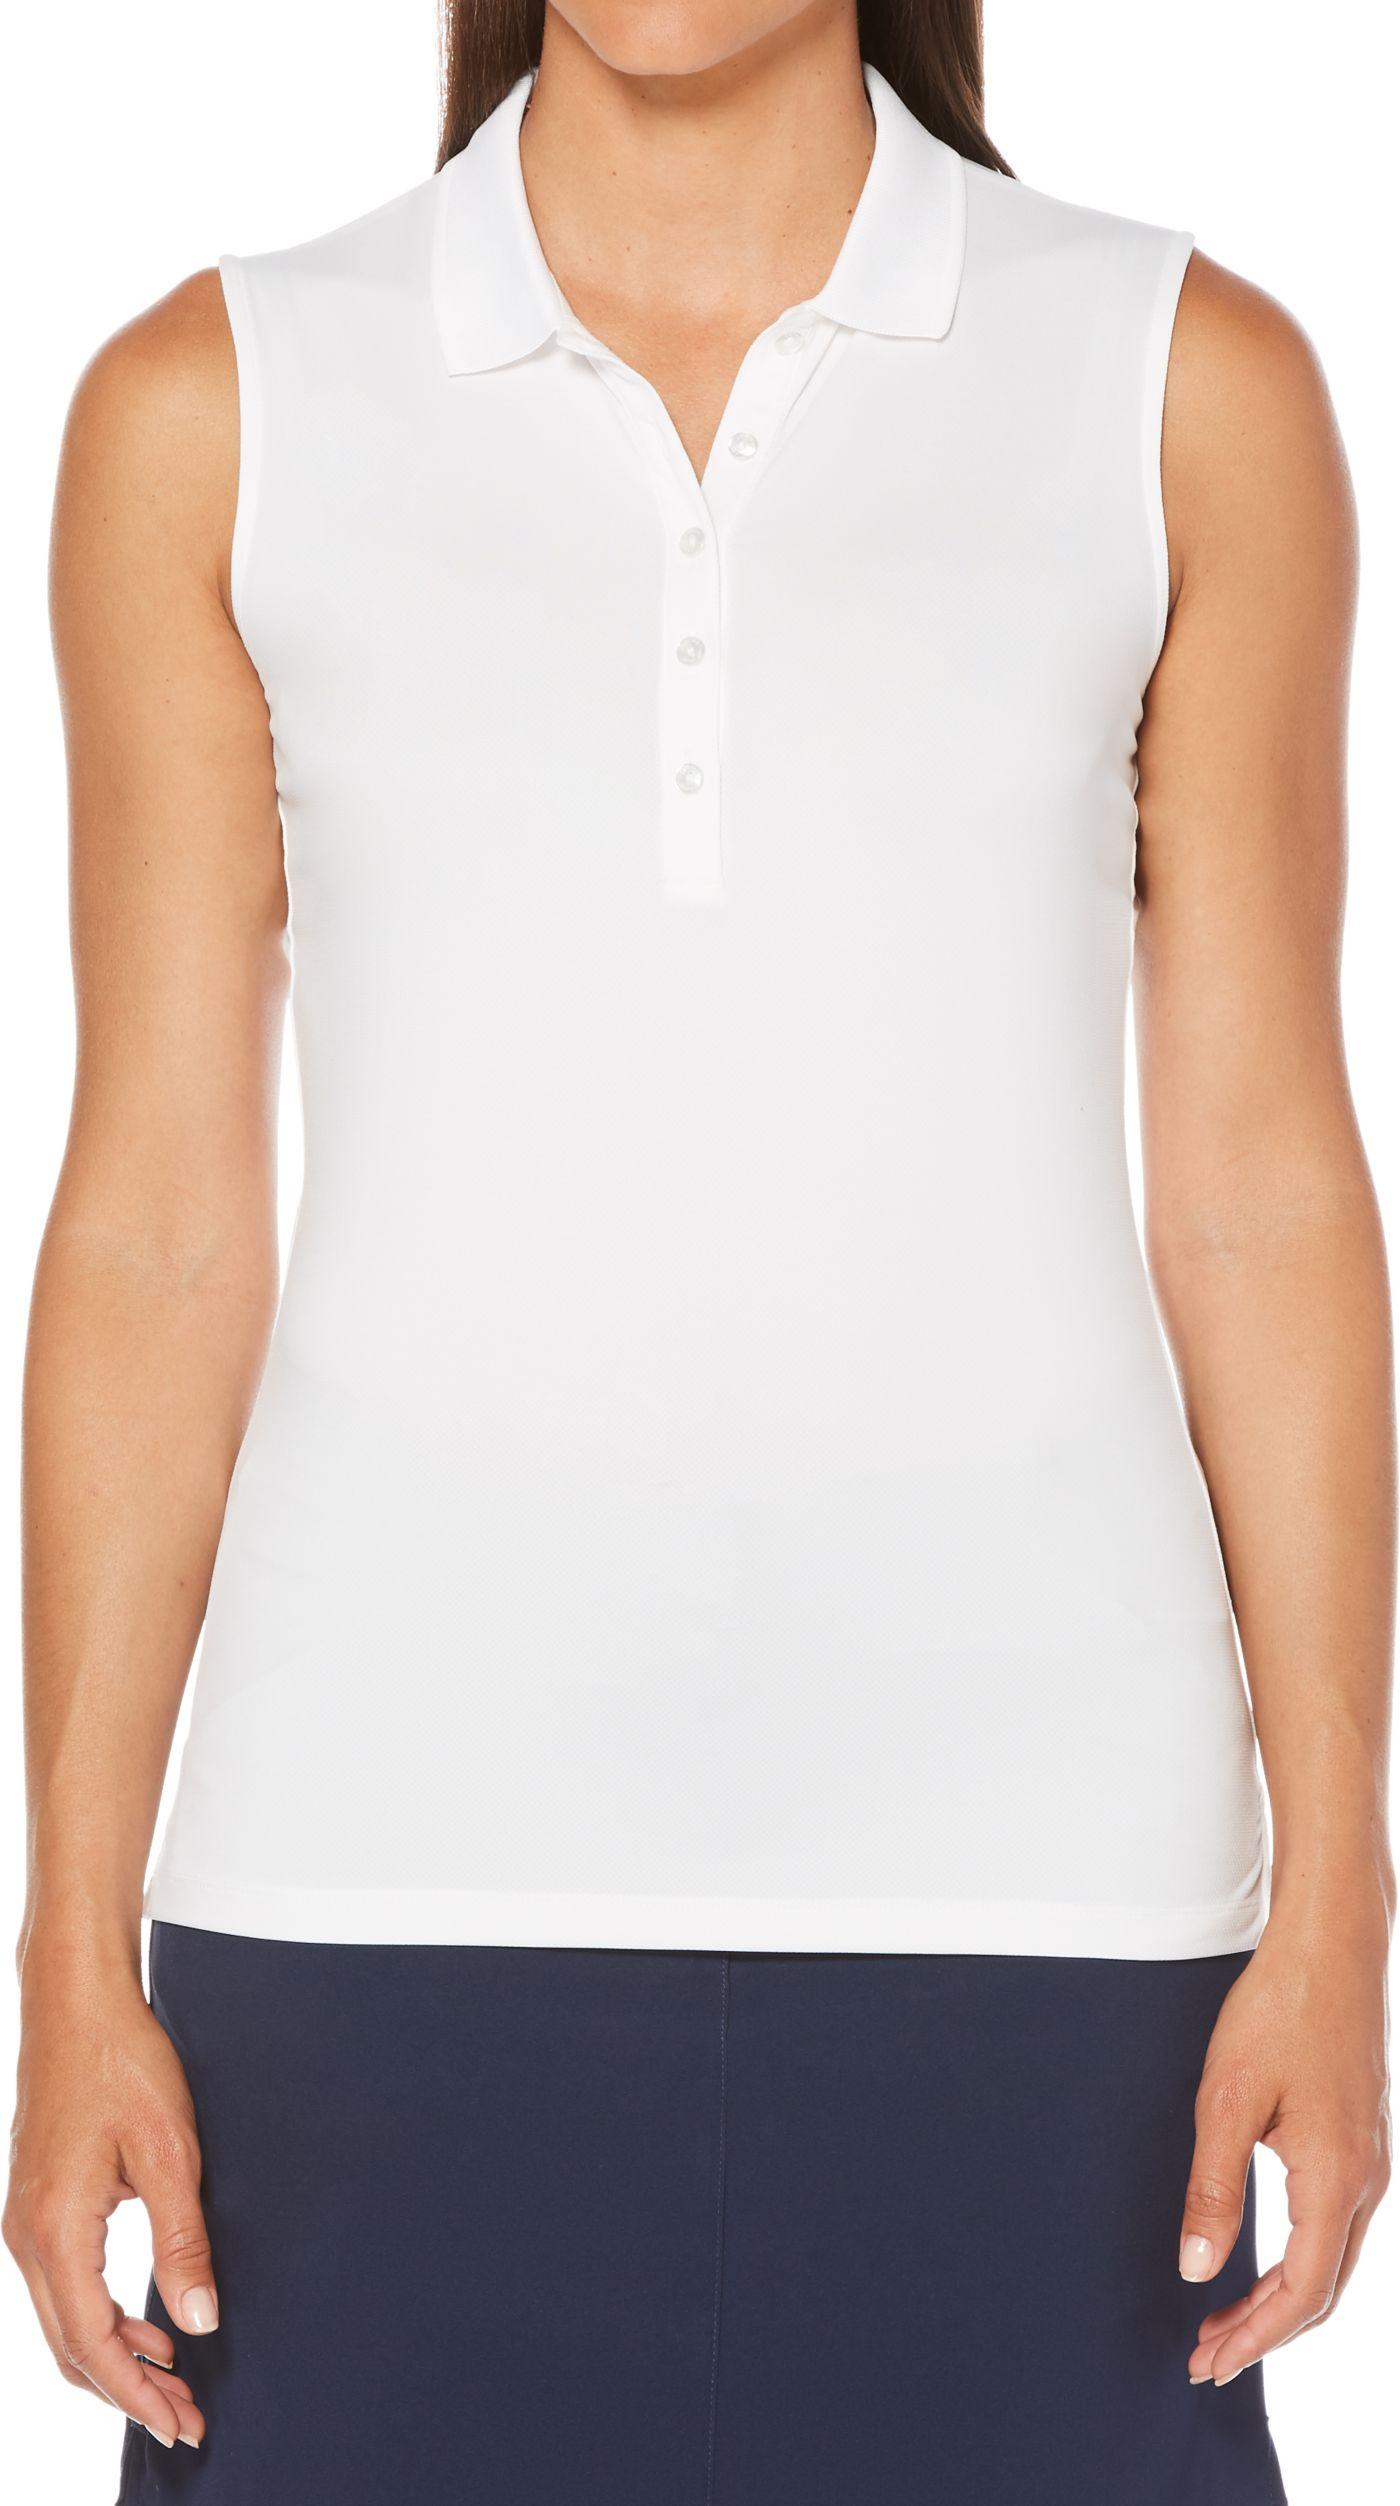 Callaway Women's Sleeveless Core Solid Micro Hex Golf Polo